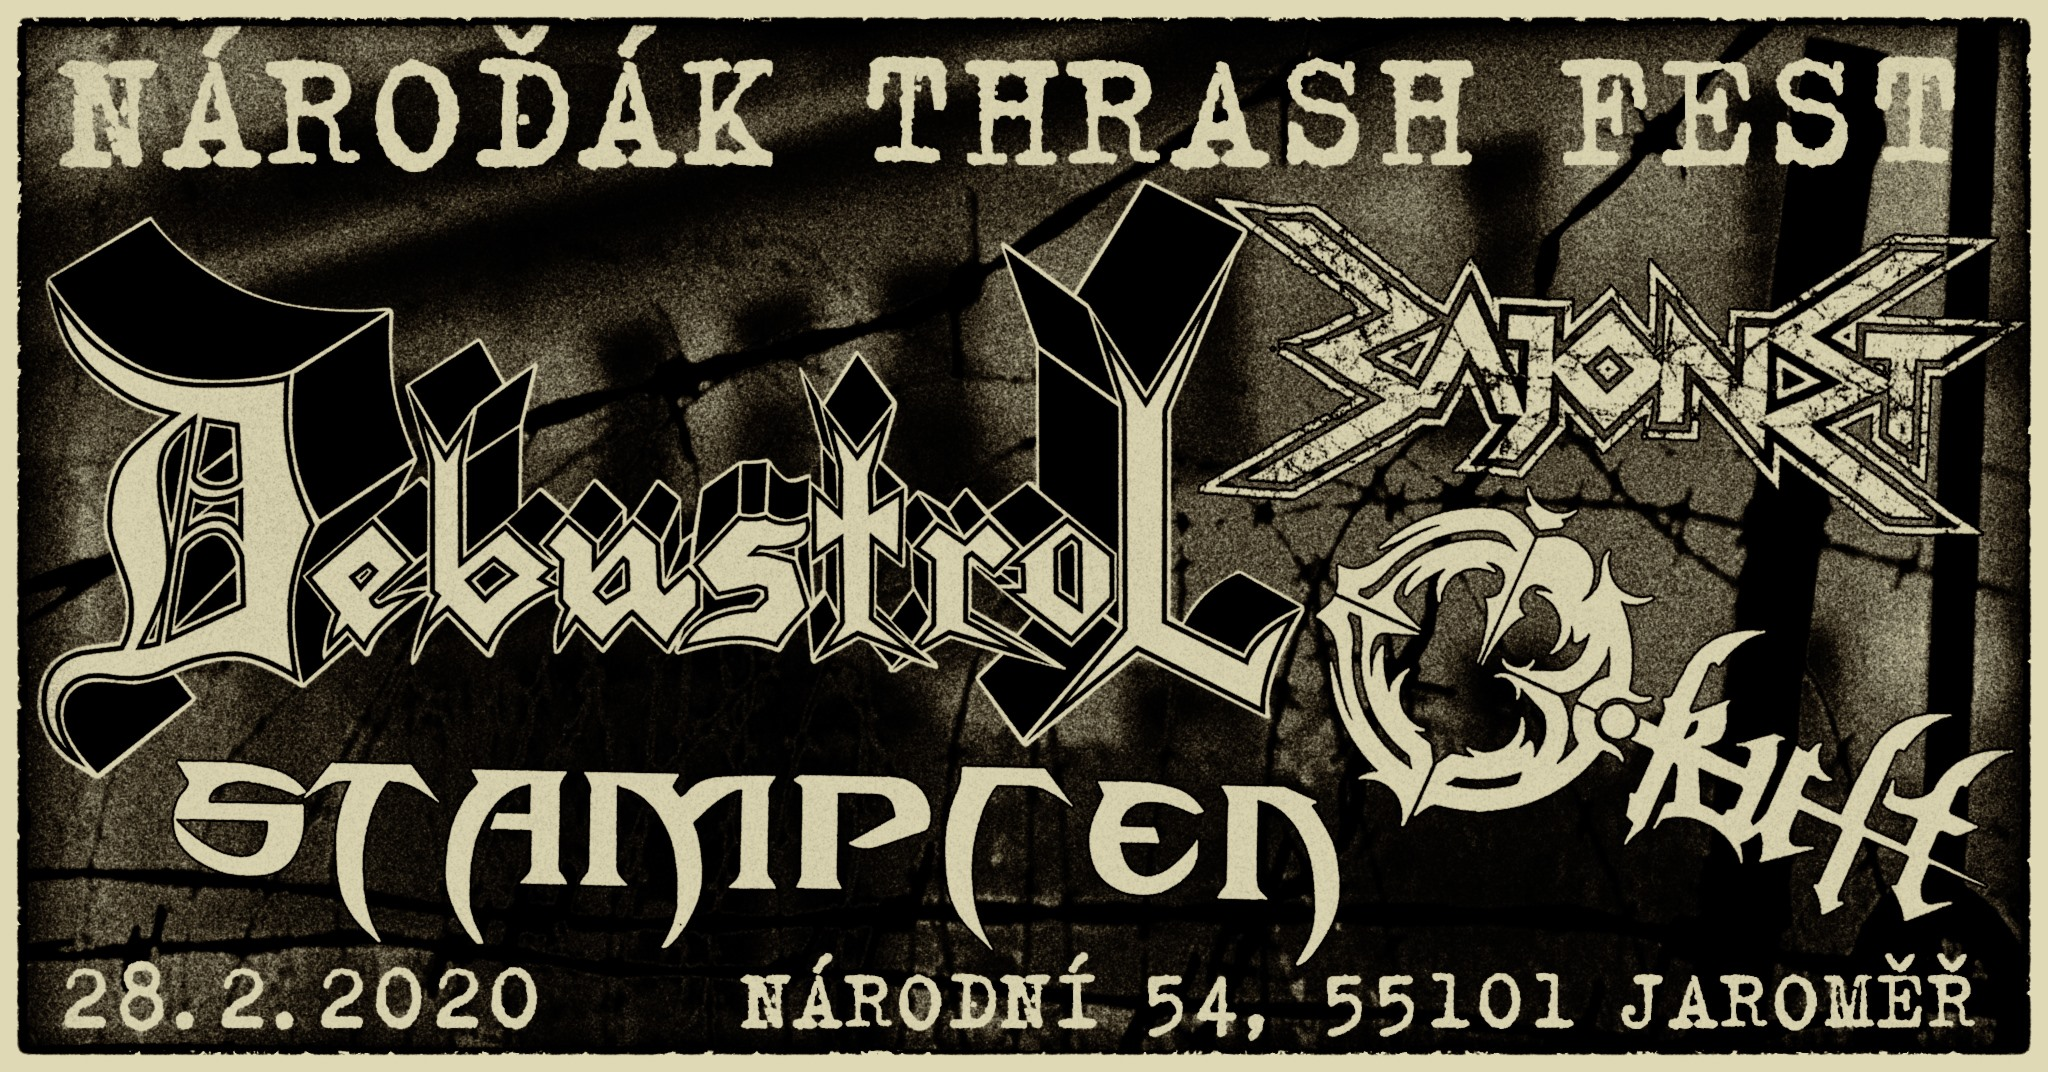 Thrash Fest